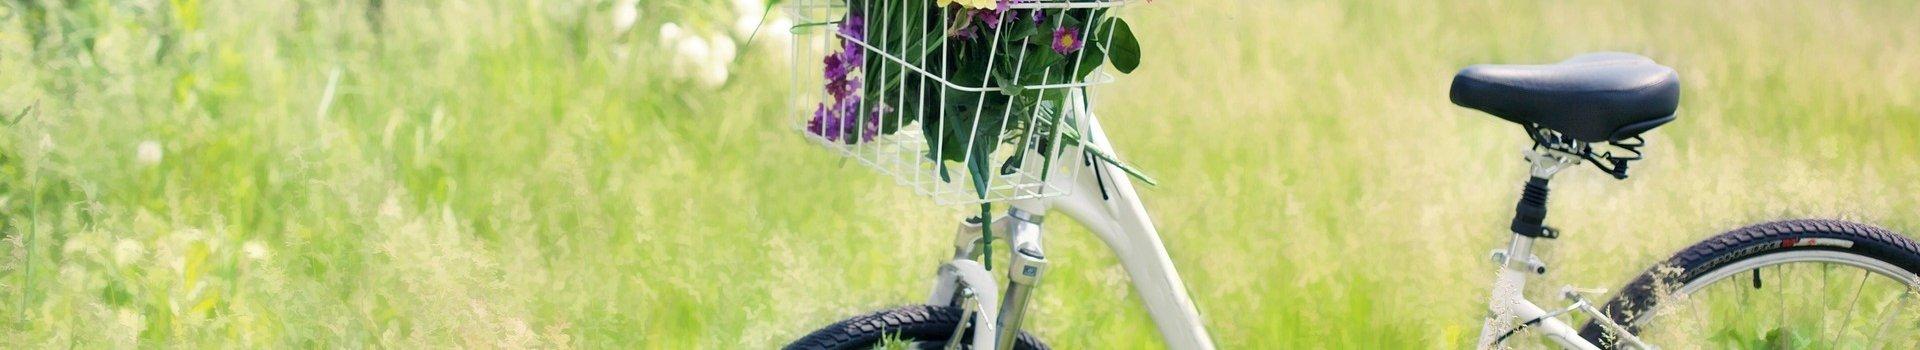 Rower miejski – komu posłuży najlepiej?